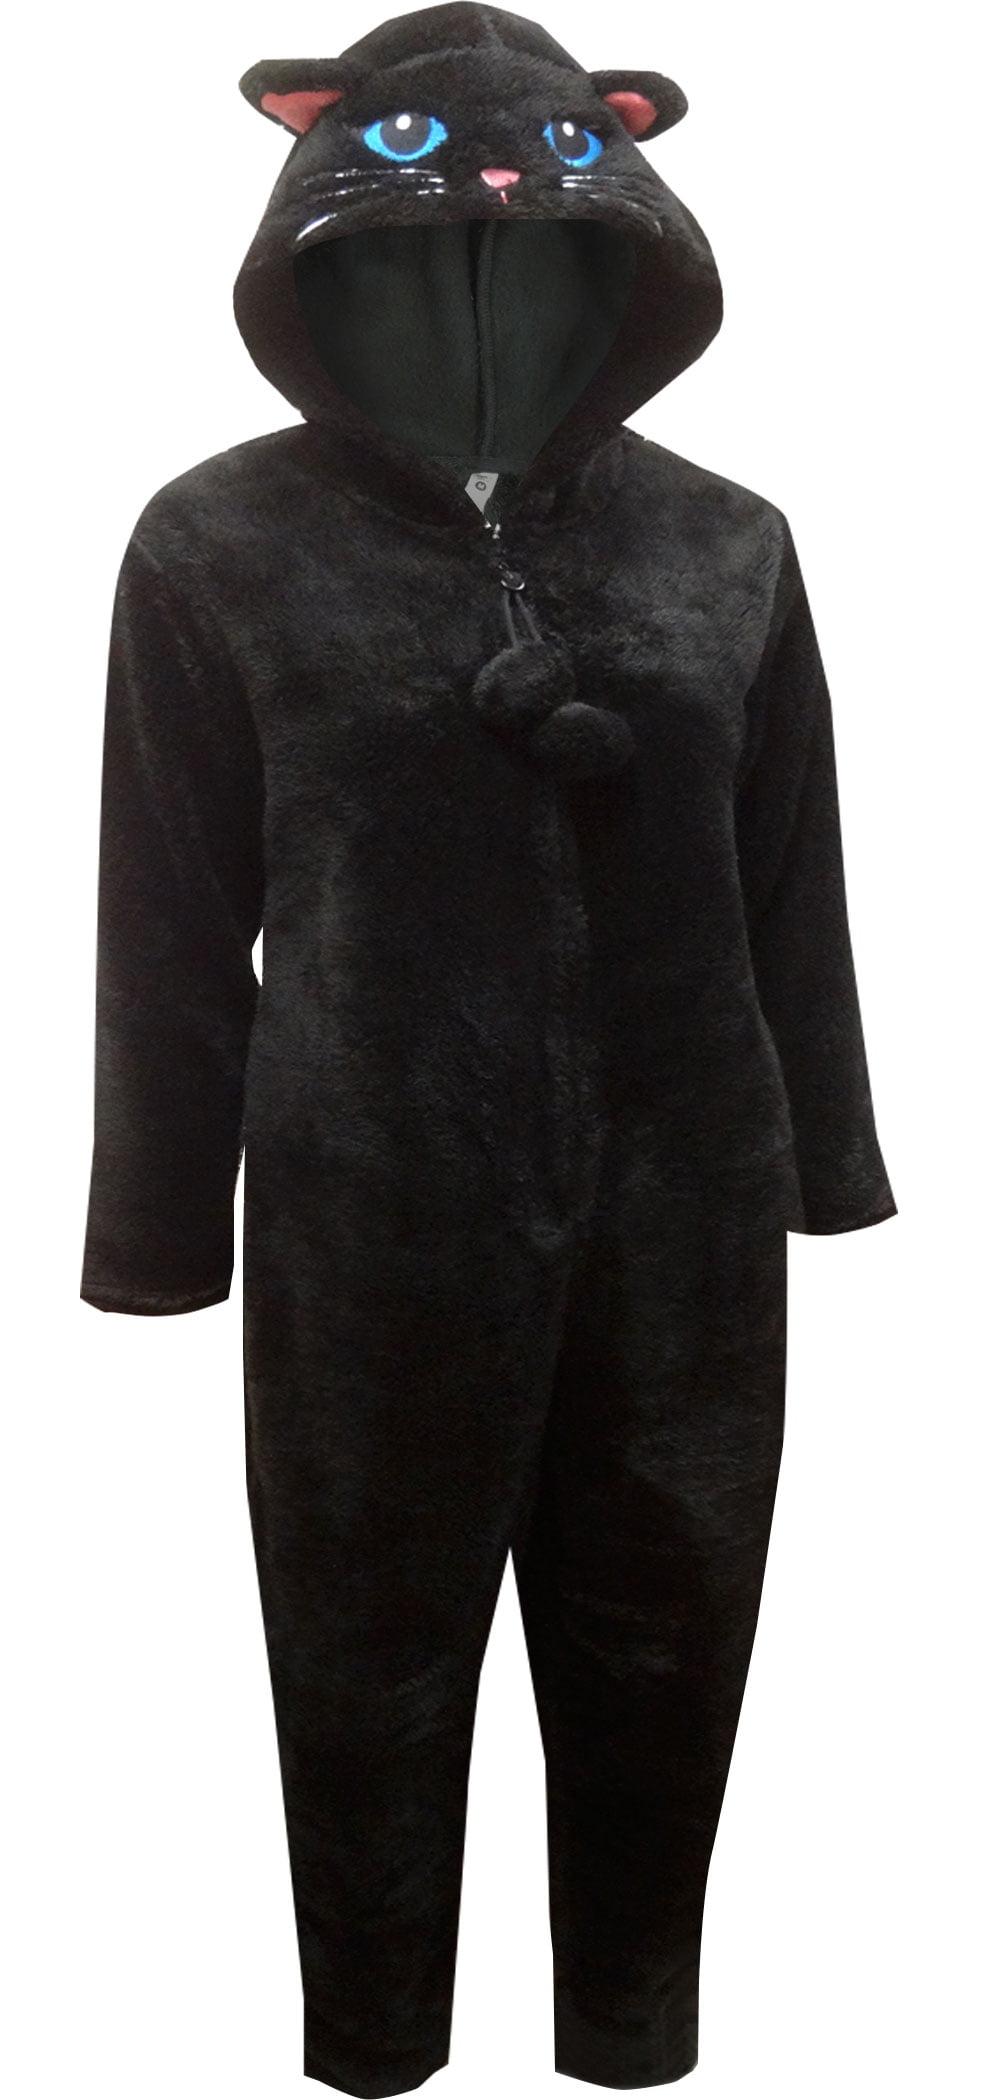 Girl Krazy Women's Plush Black Cat Onesie Hooded Pajama ...